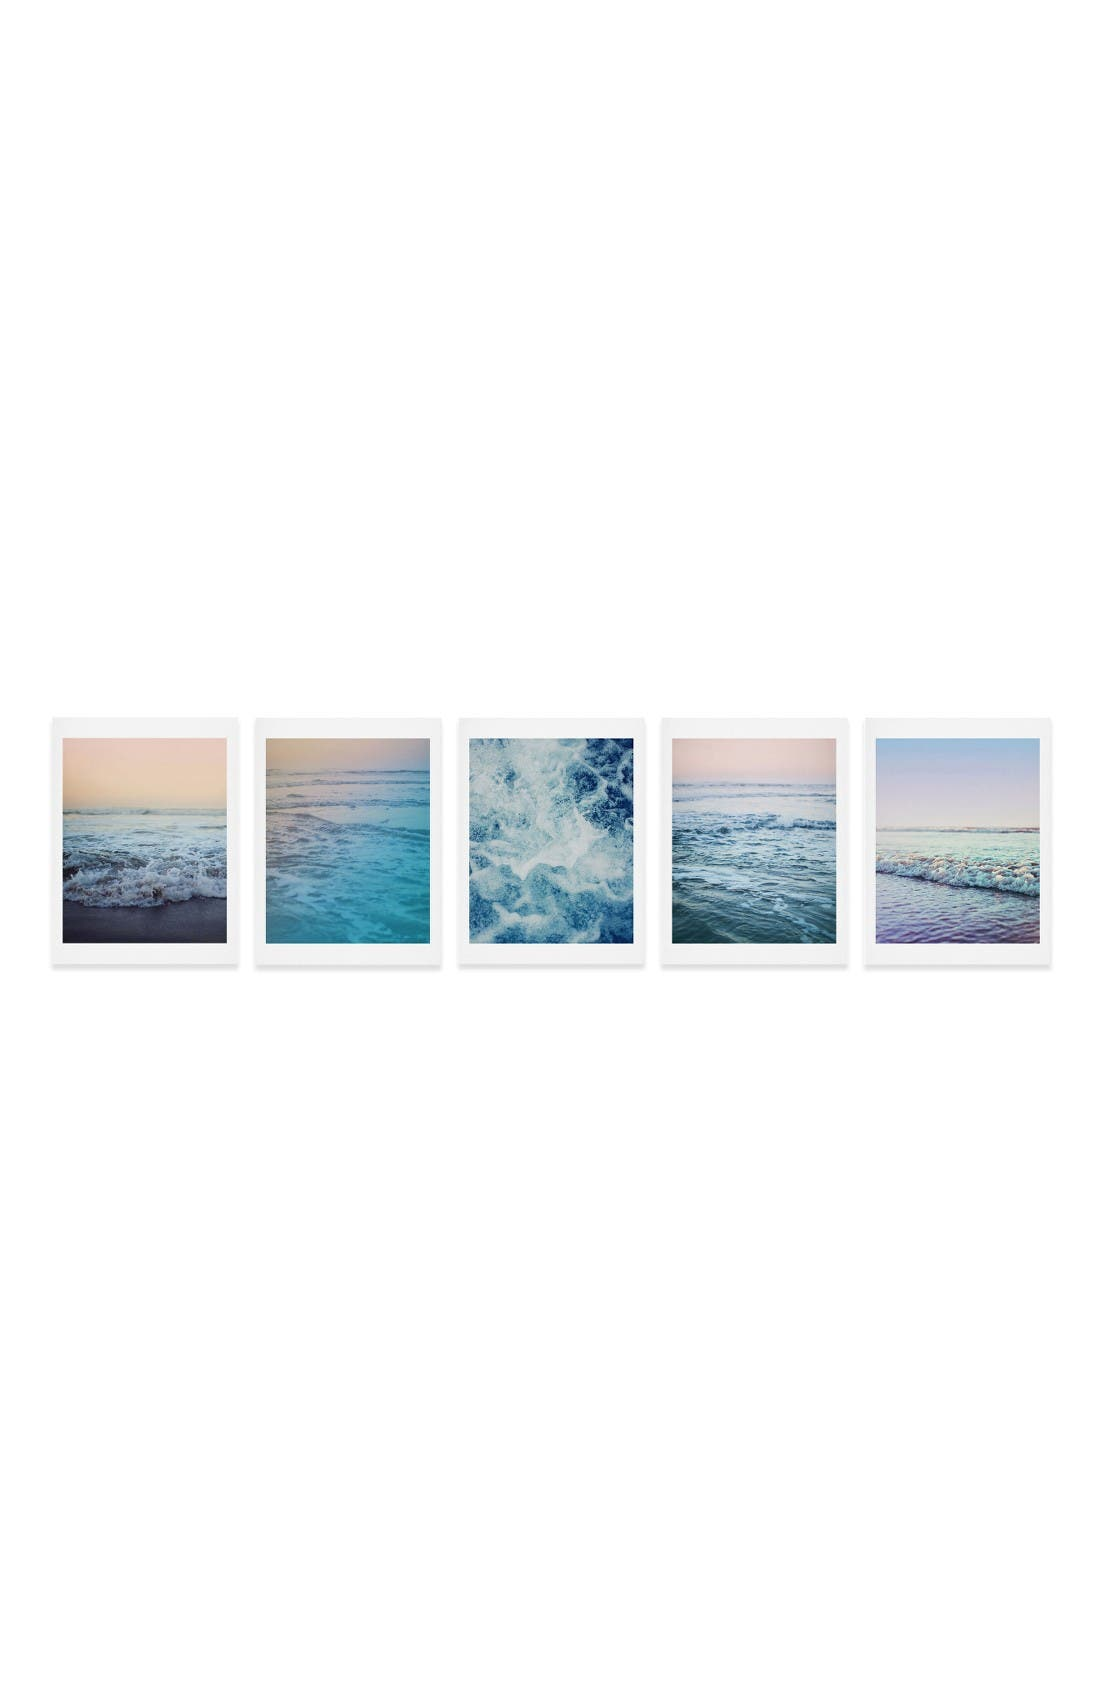 Alternate Image 1 Selected - Deny Designs Ocean Five-Piece Gallery Wall Art Print Set